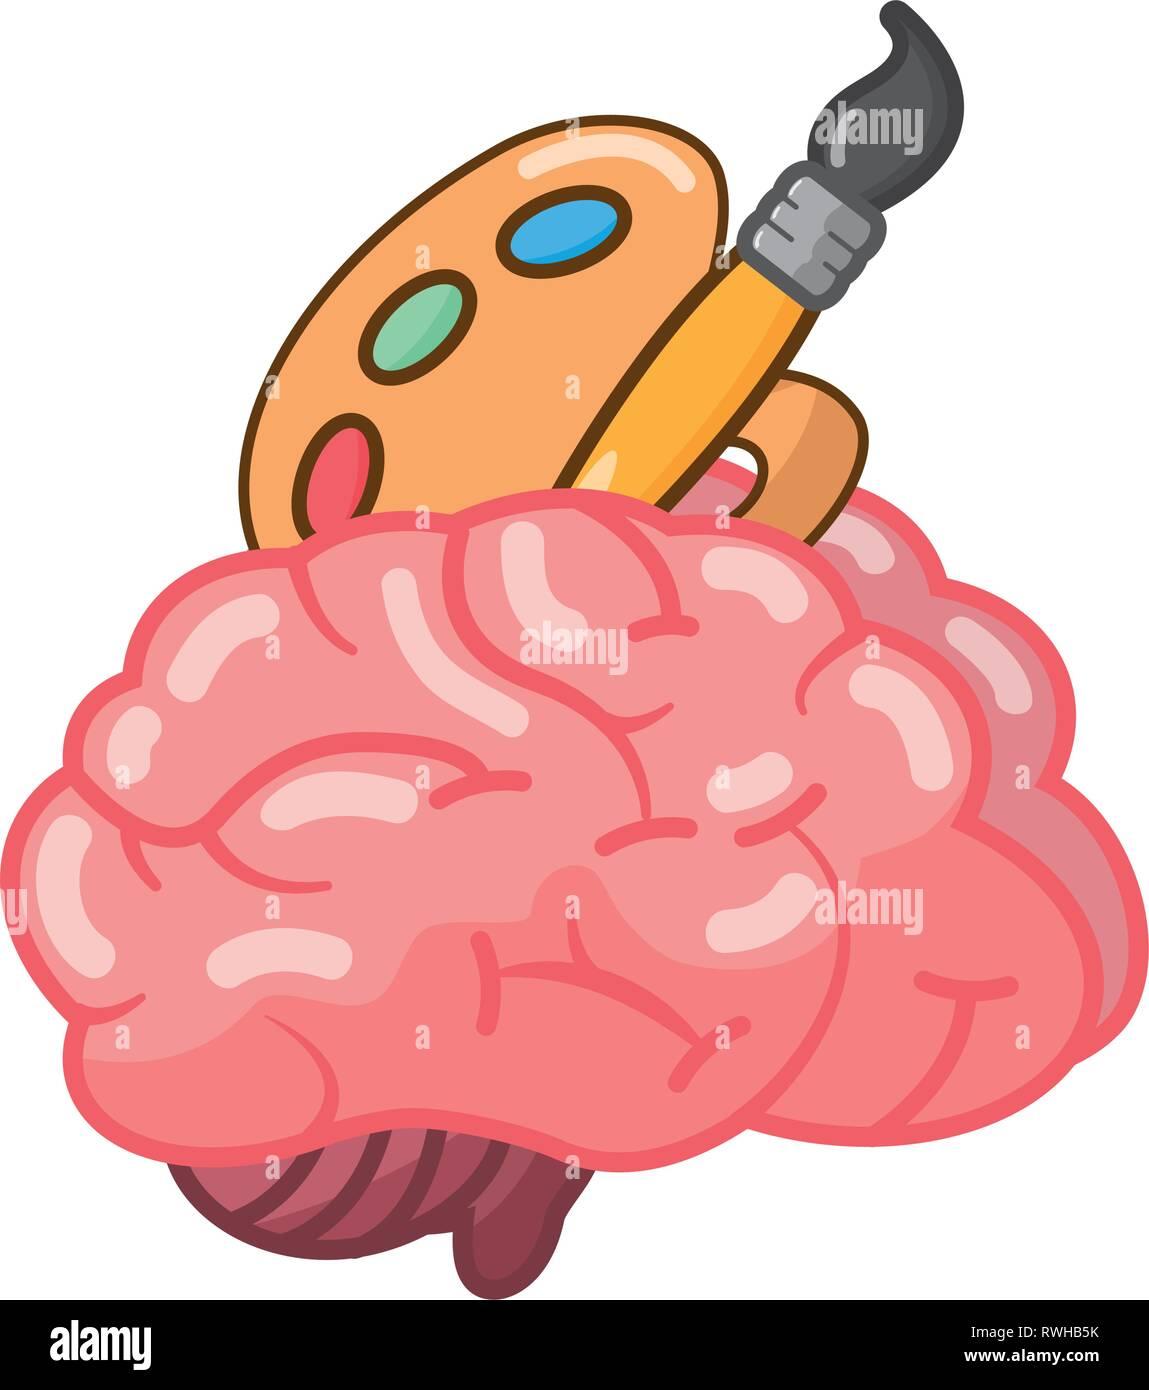 brain idea creativity - Stock Image